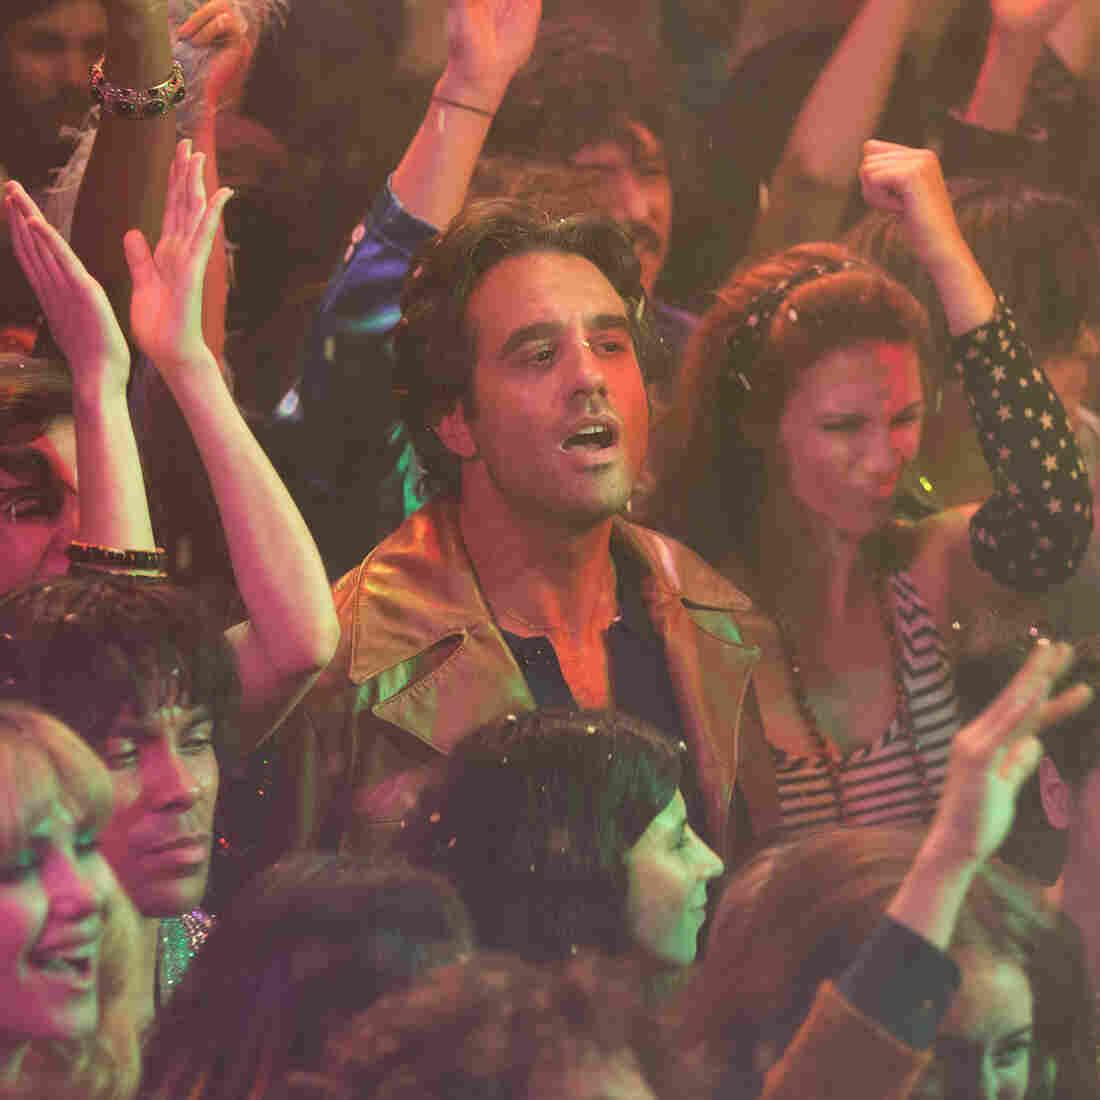 HBO's '70s Rock Series 'Vinyl' Sings A Familiar Tune